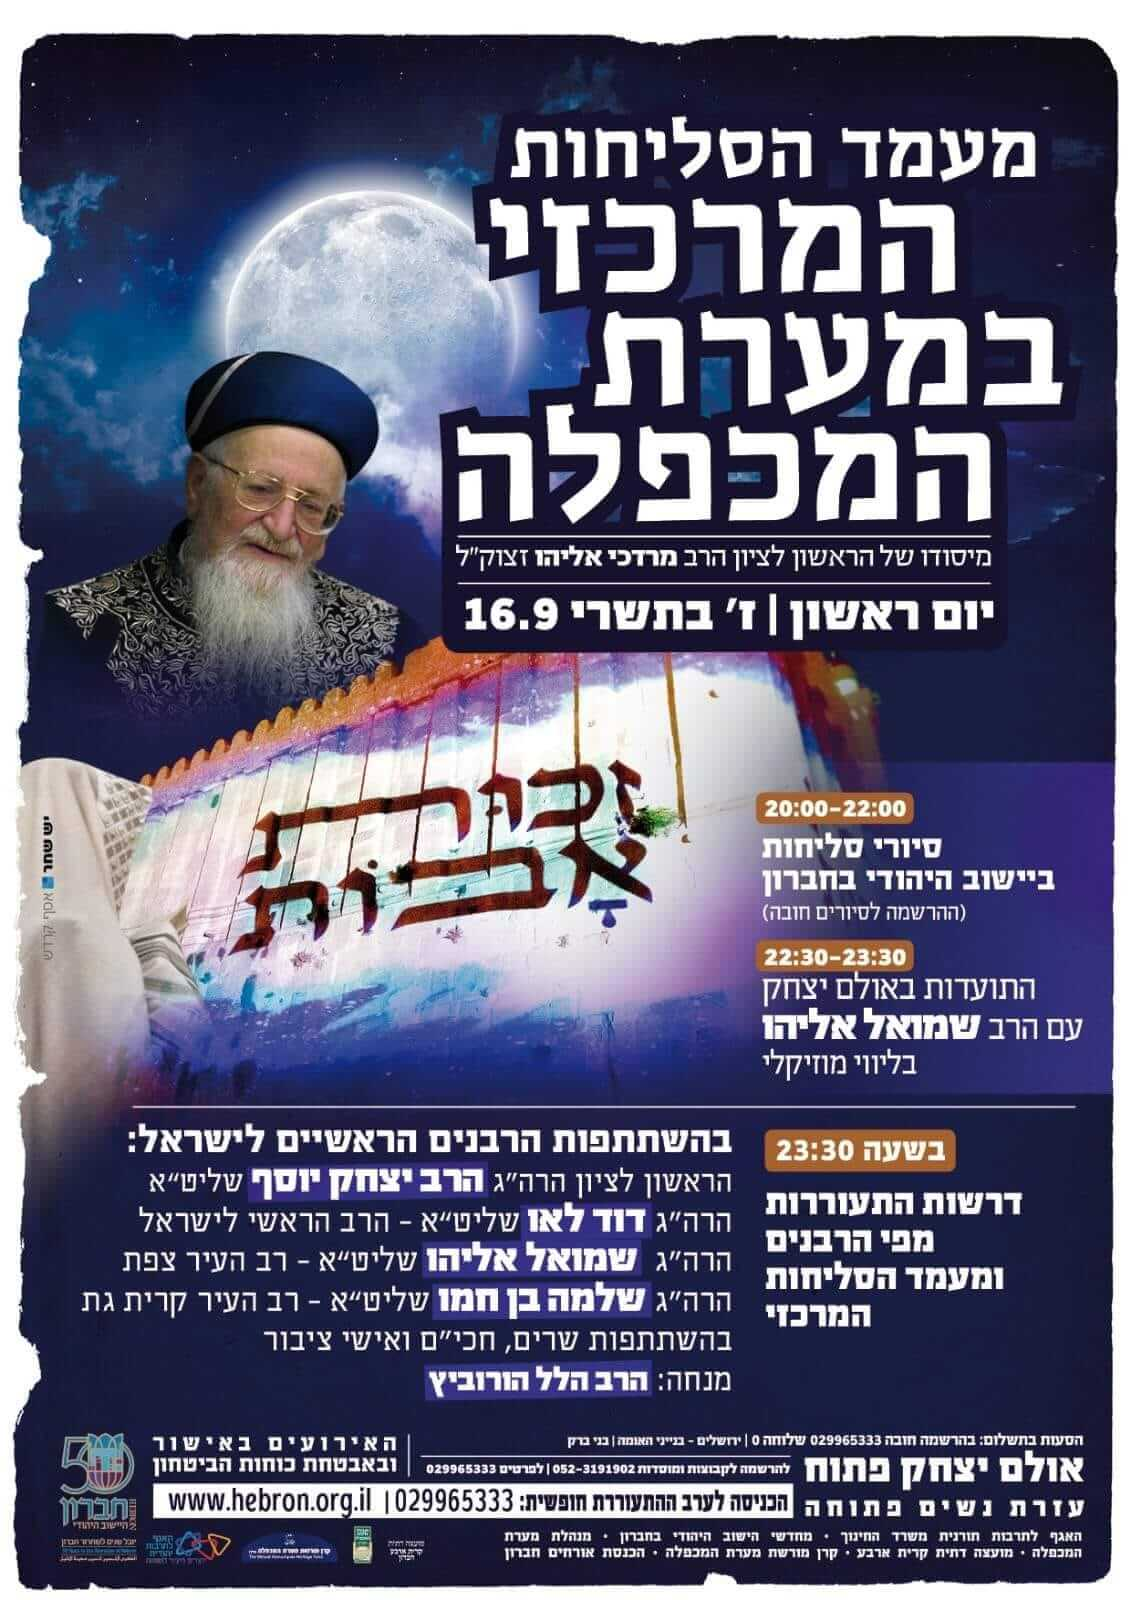 Flyer for Mega Selichot event in Hebron